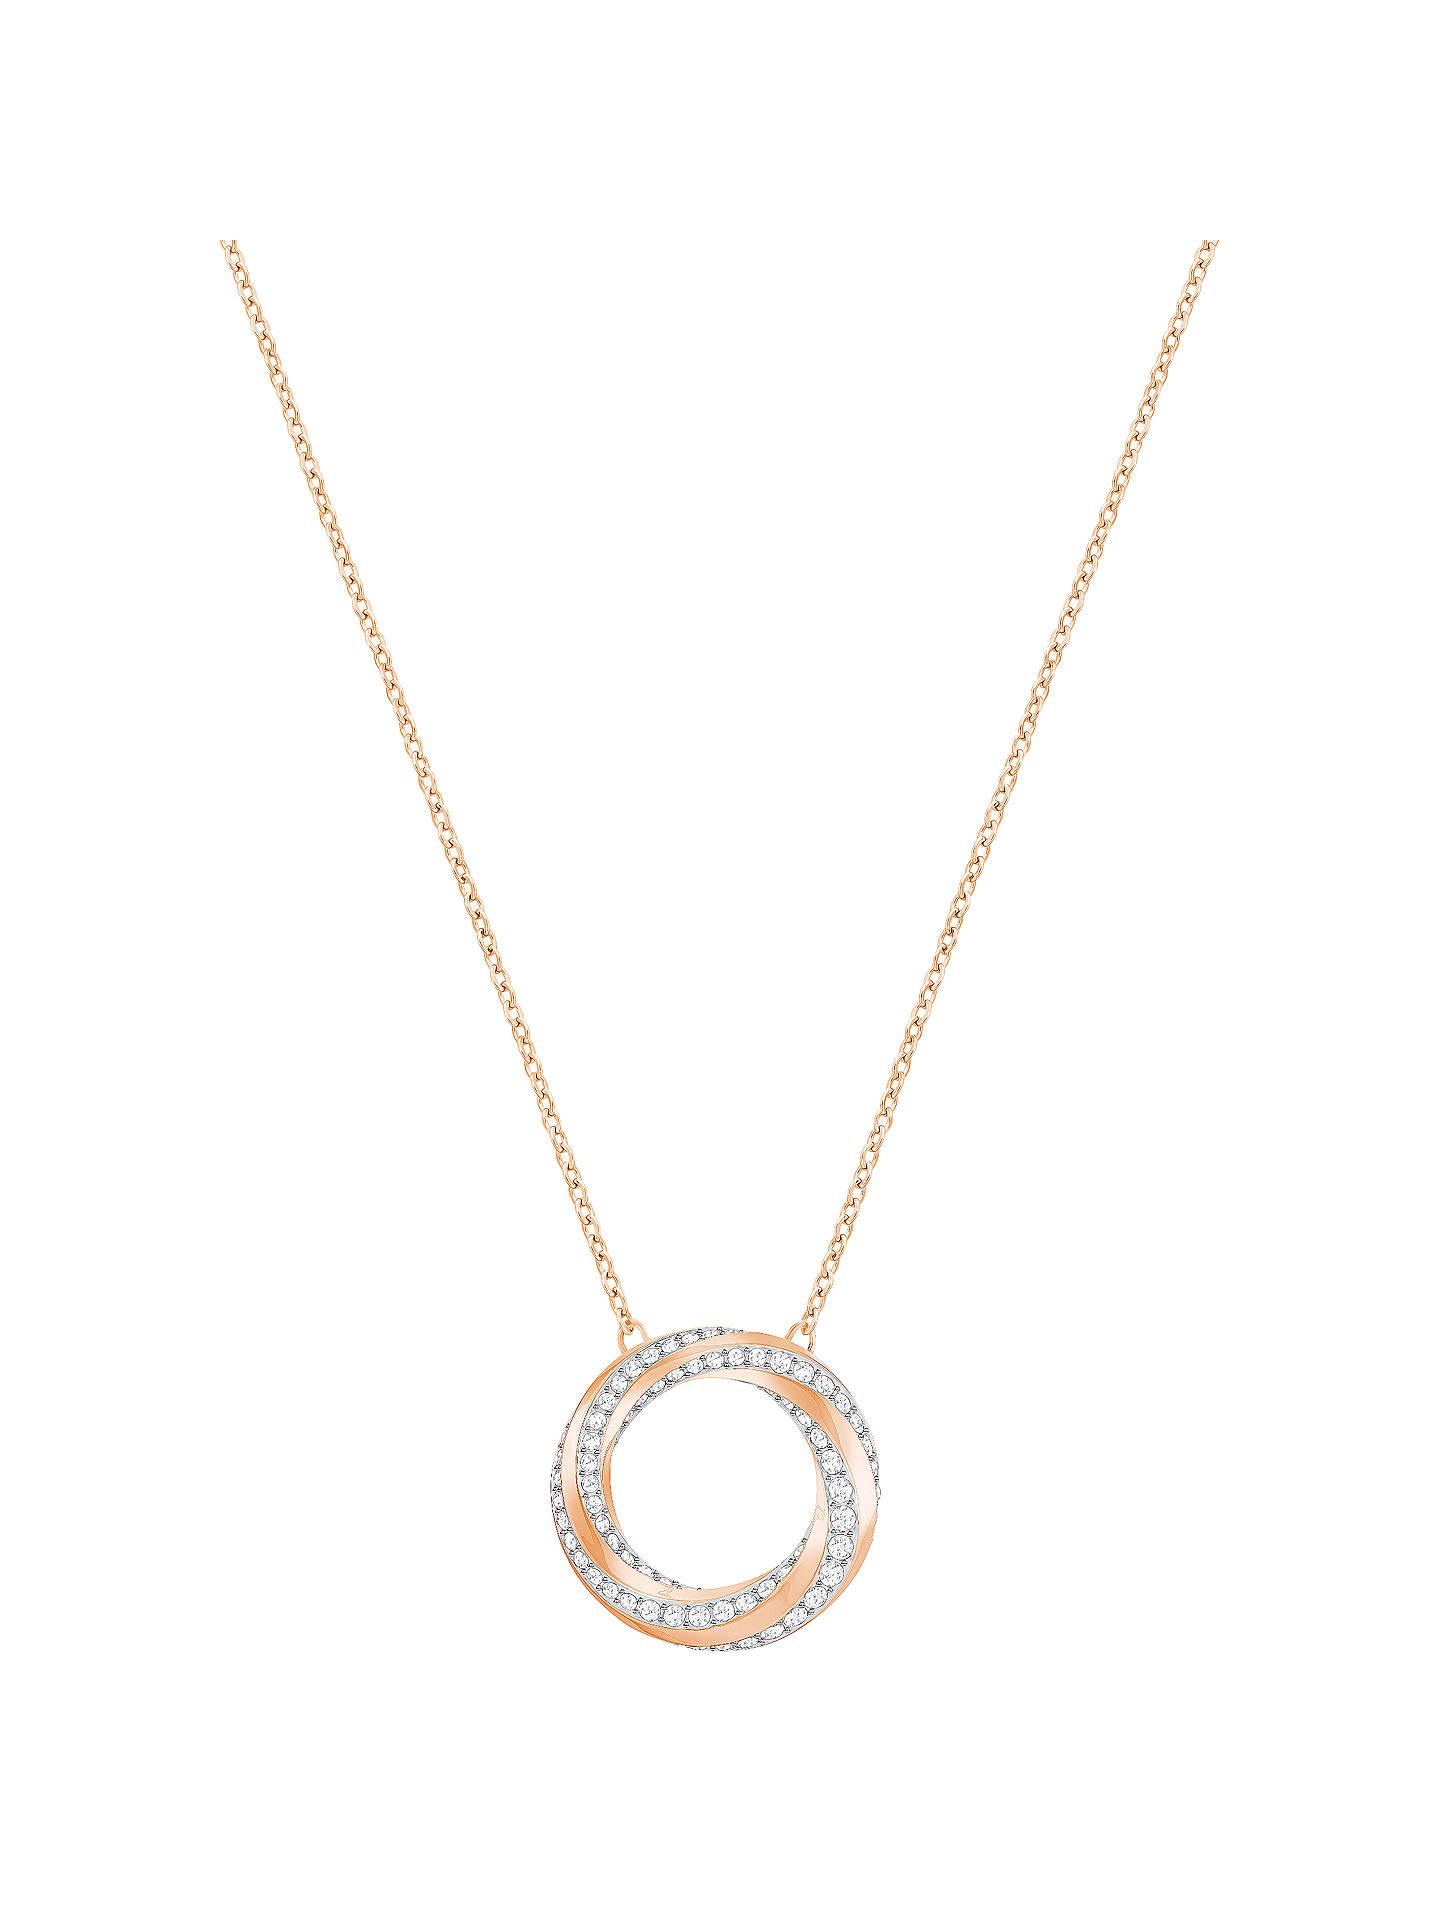 8c8bc19276e1f Swarovski Hilt Crystal Swirl Pendant Necklace at John Lewis & Partners